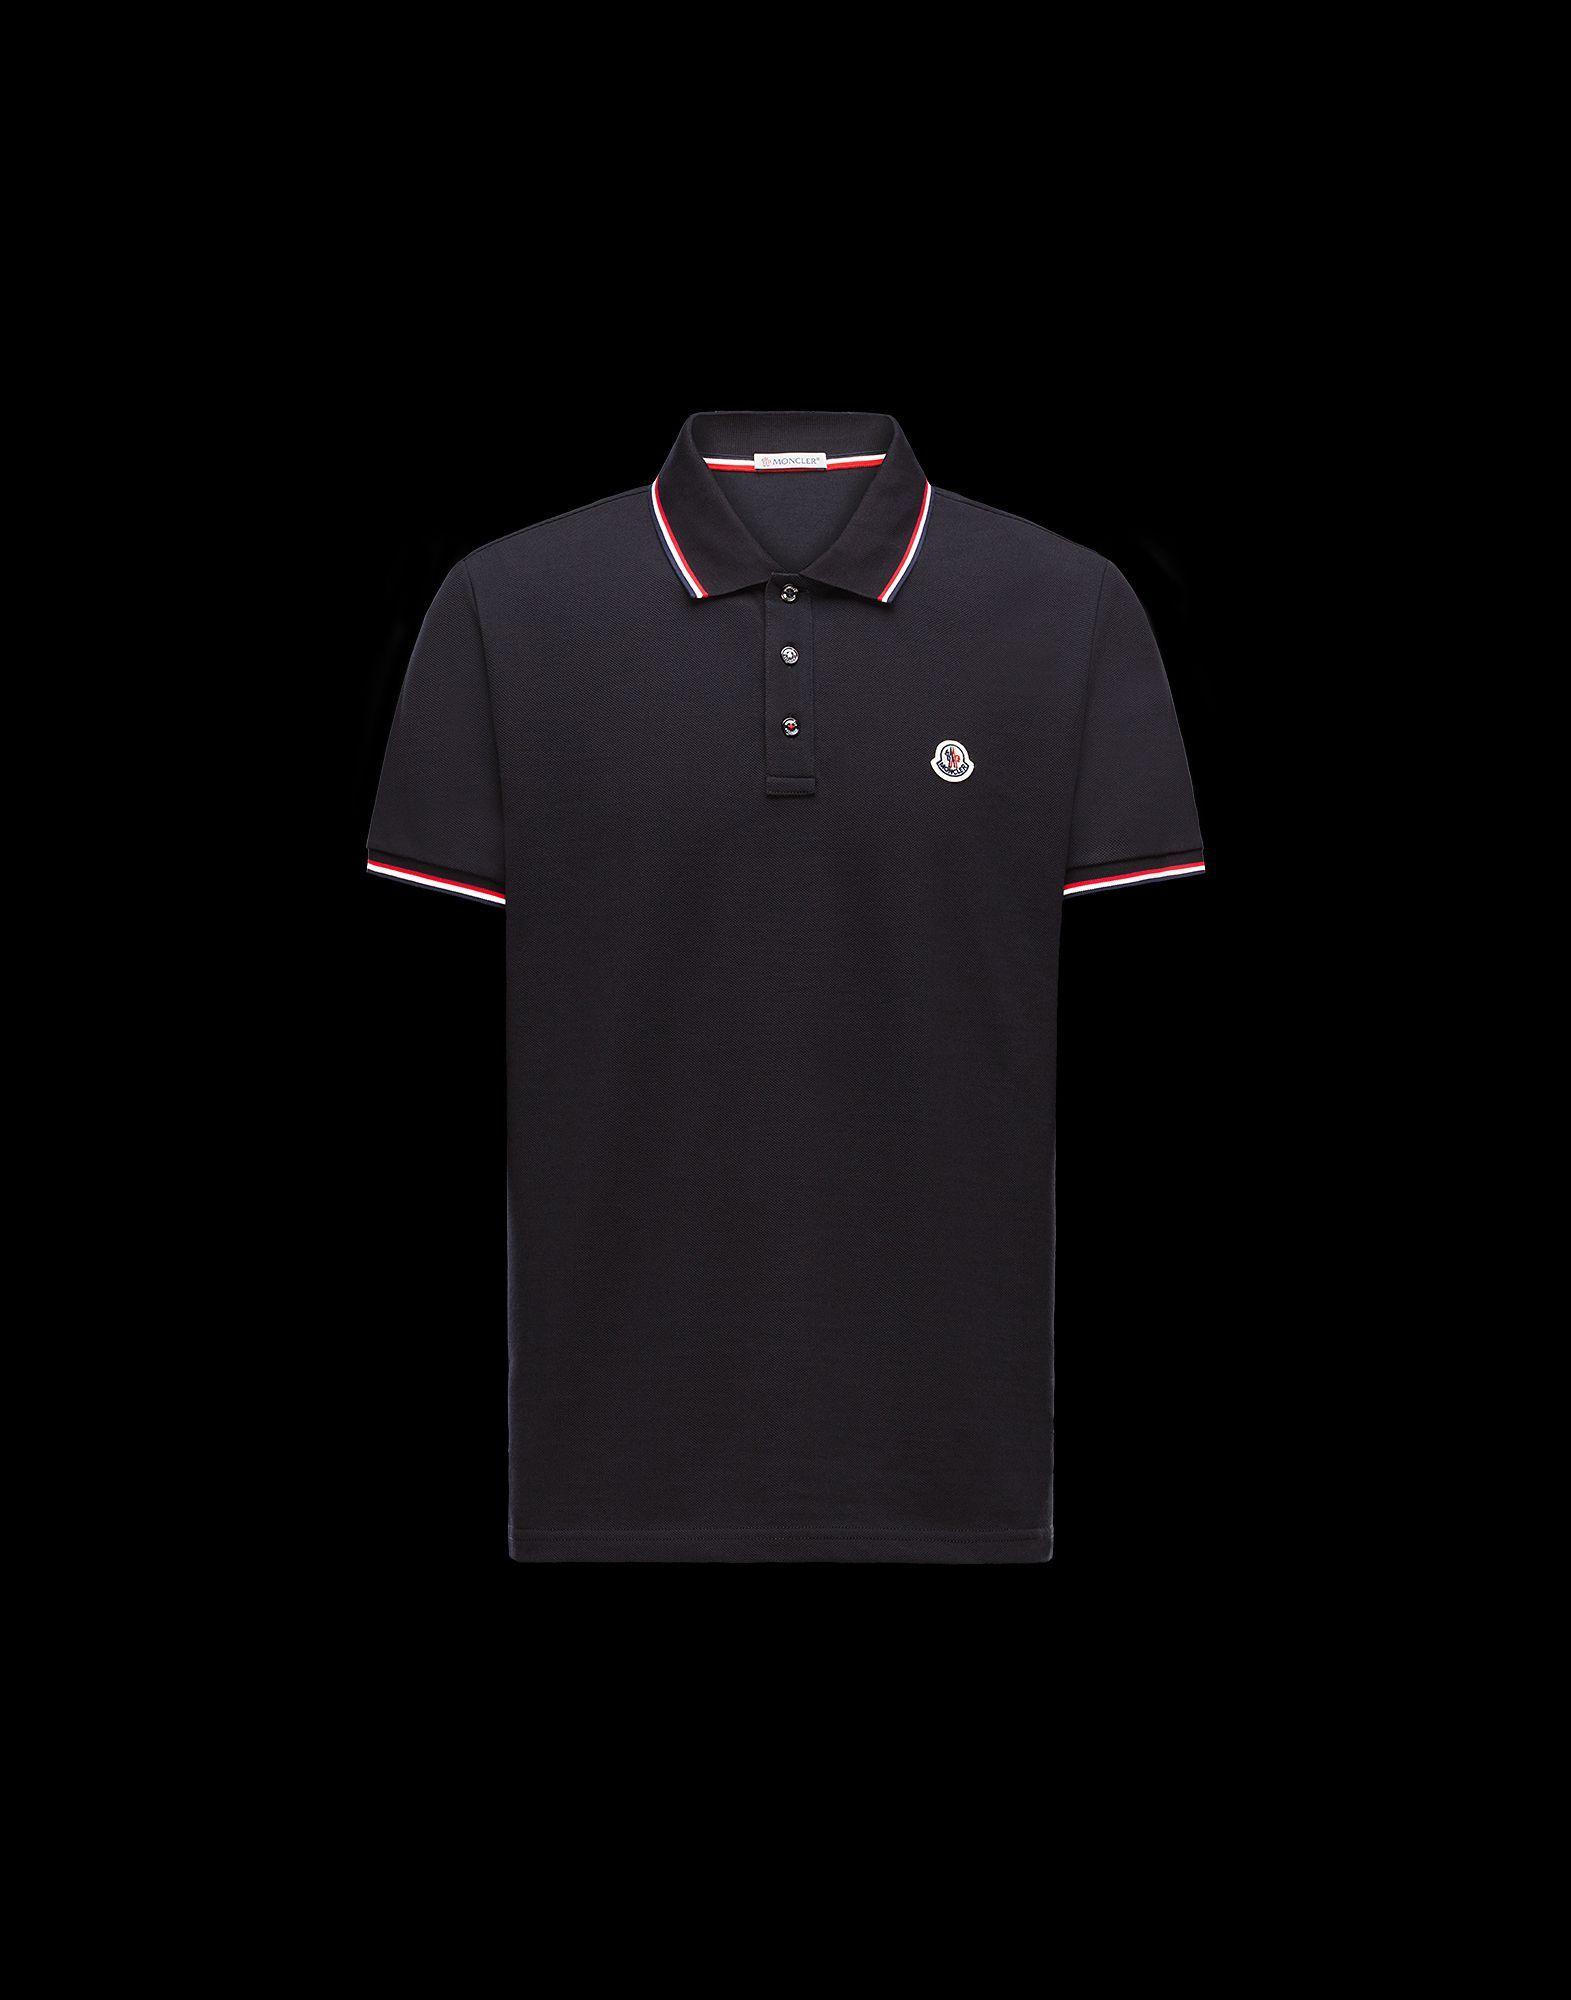 c28904ef5 Moncler POLO in Polo shirts for men